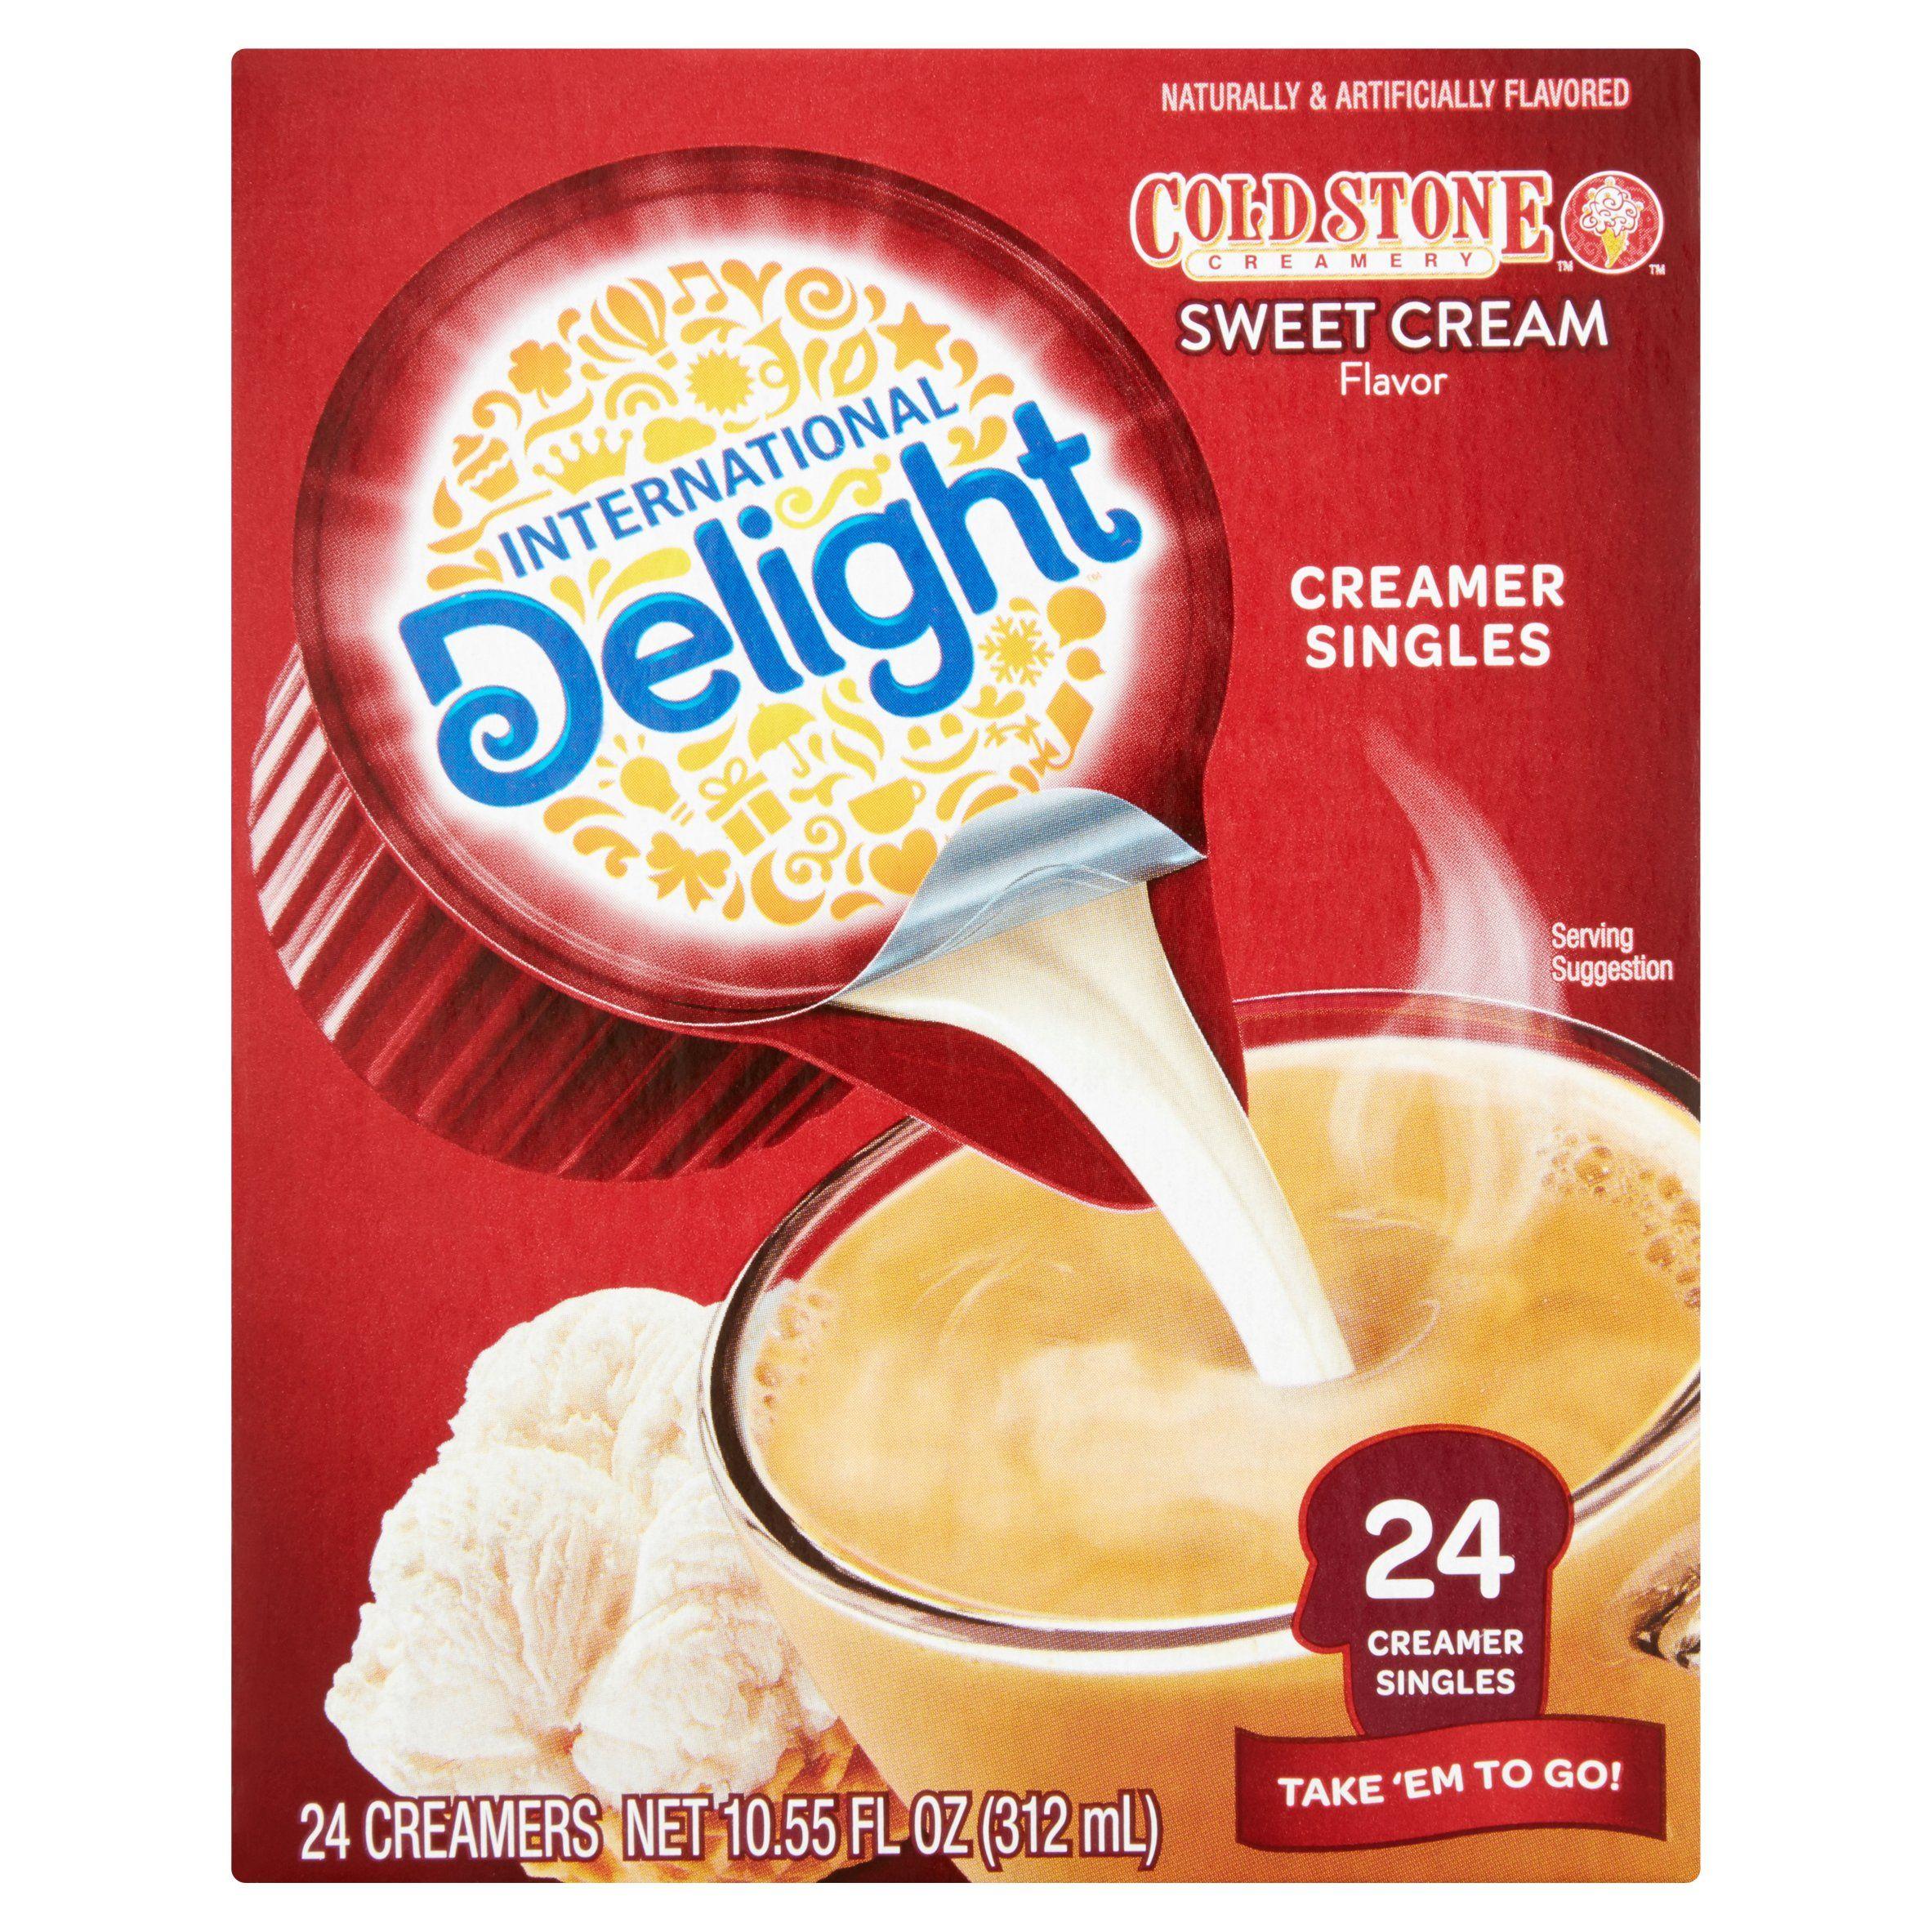 International delight cold stone sweet cream creamers 24